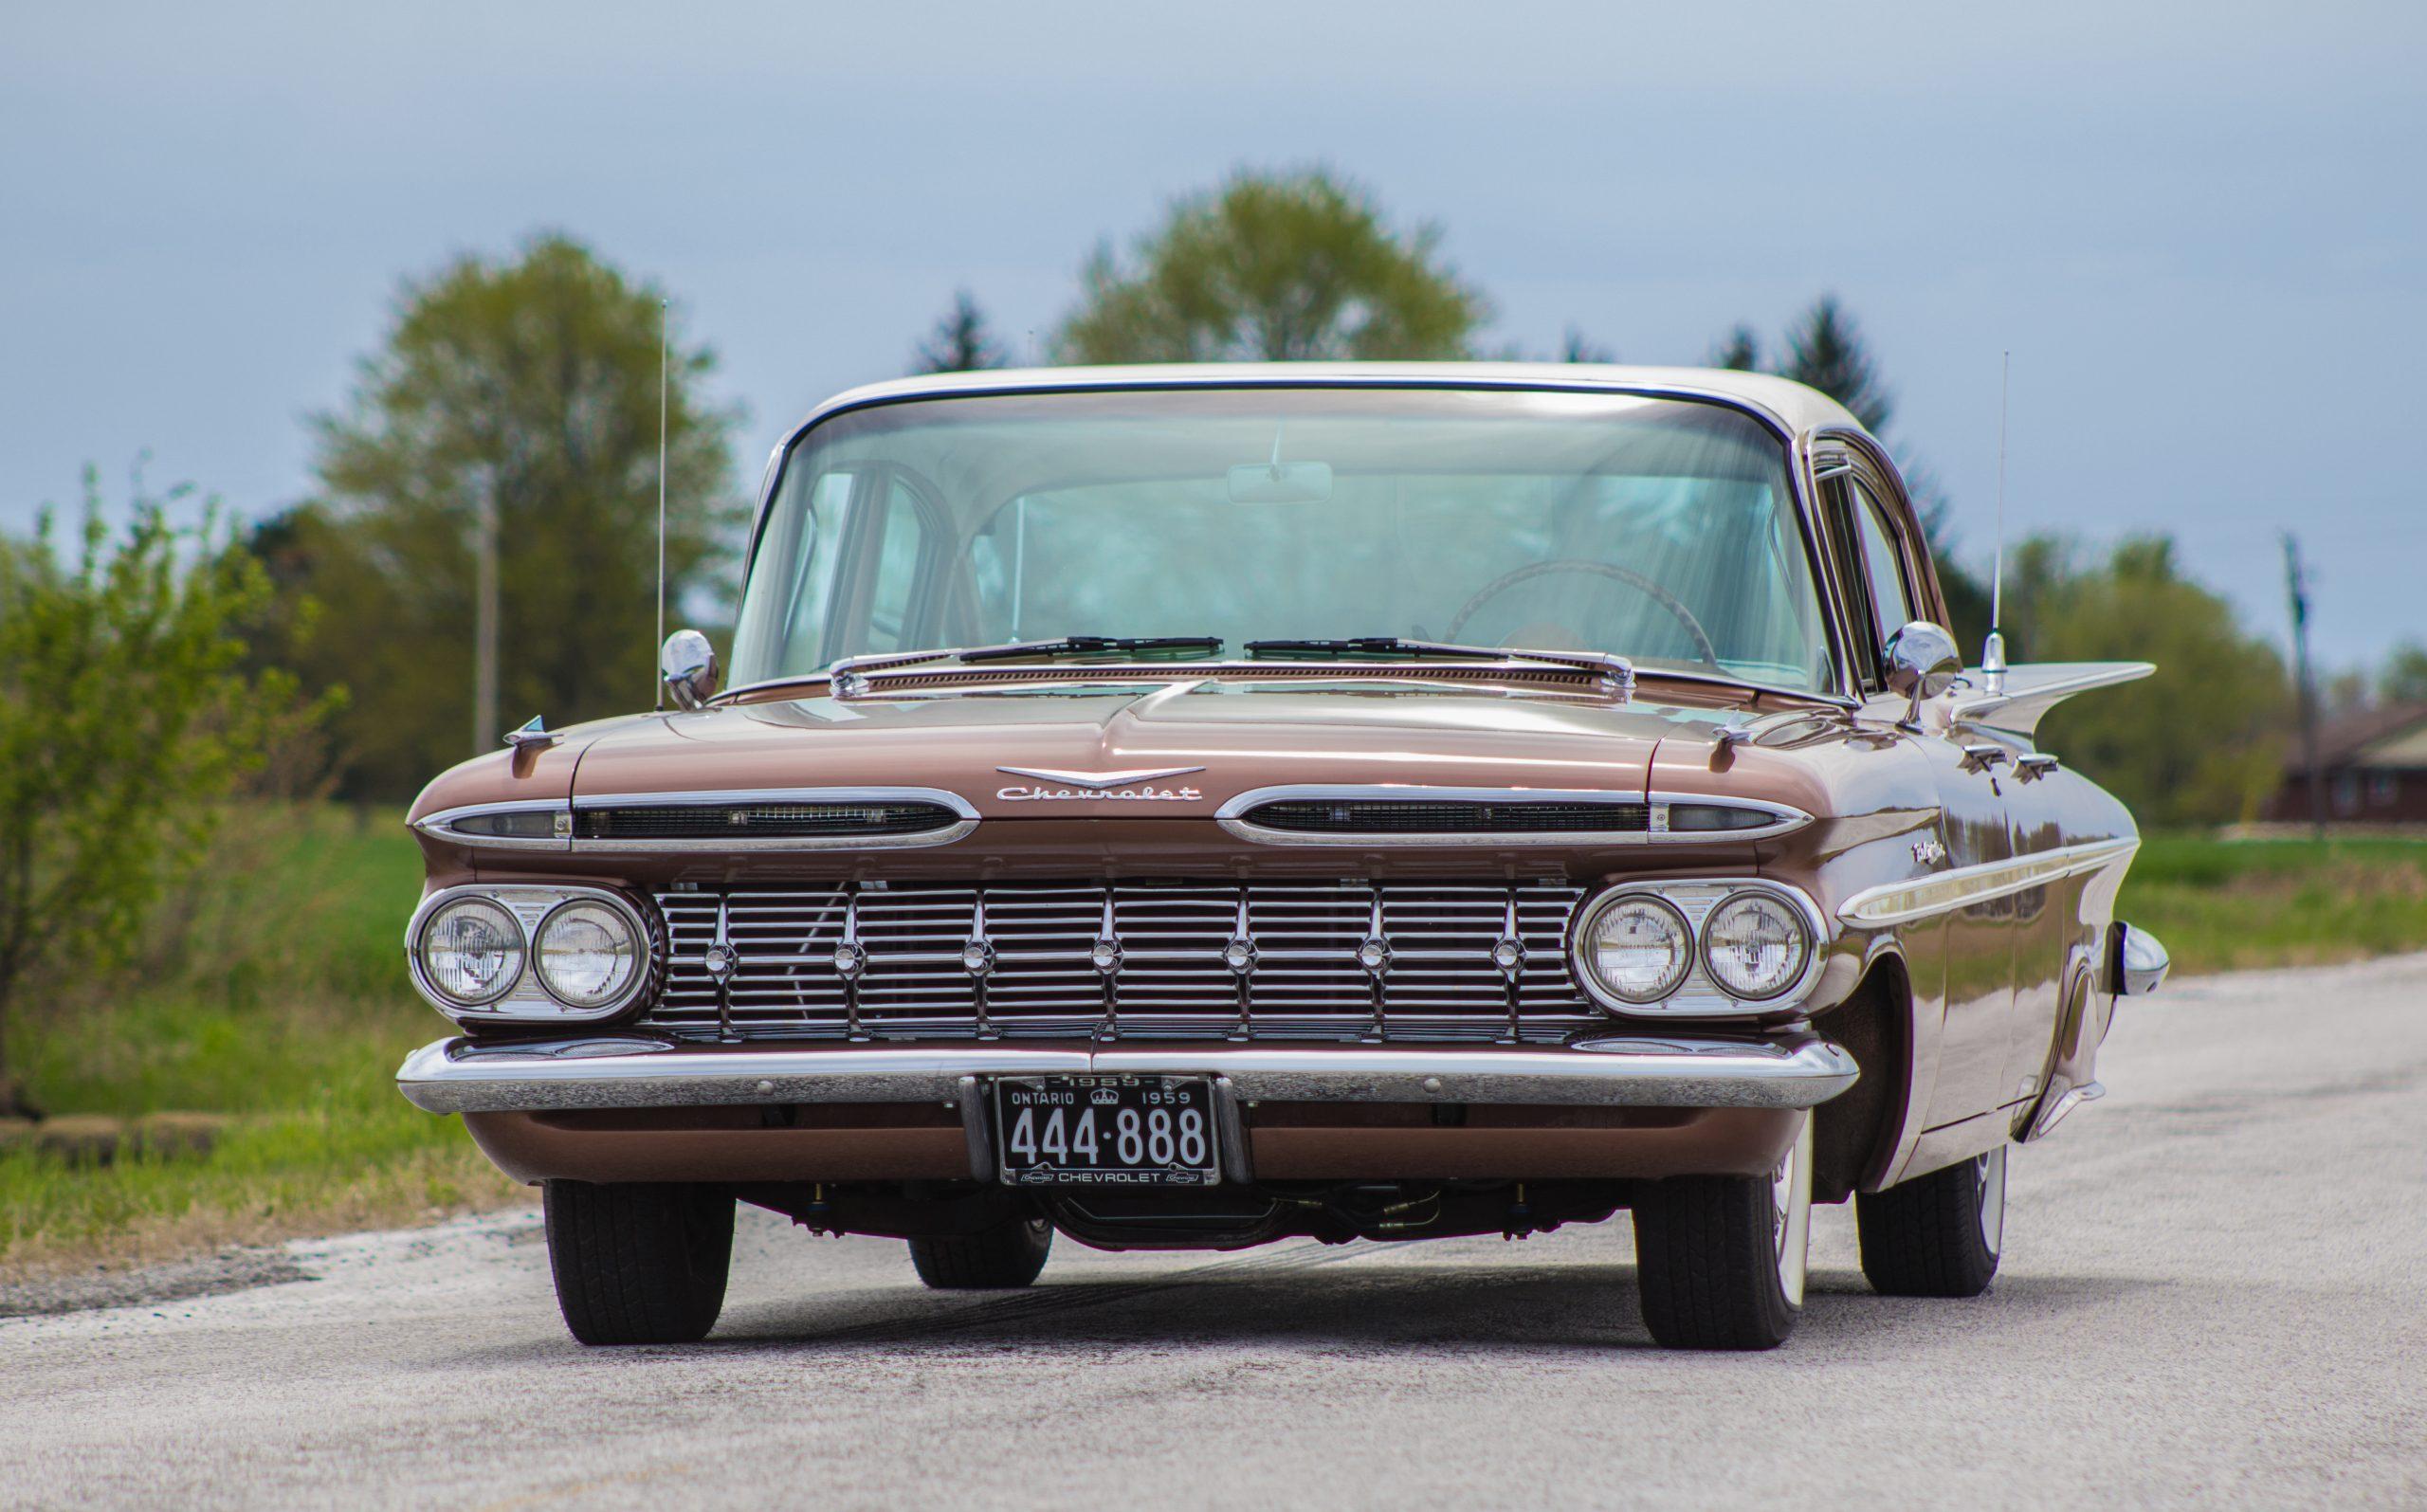 1959 Chevrolet Bel Air front